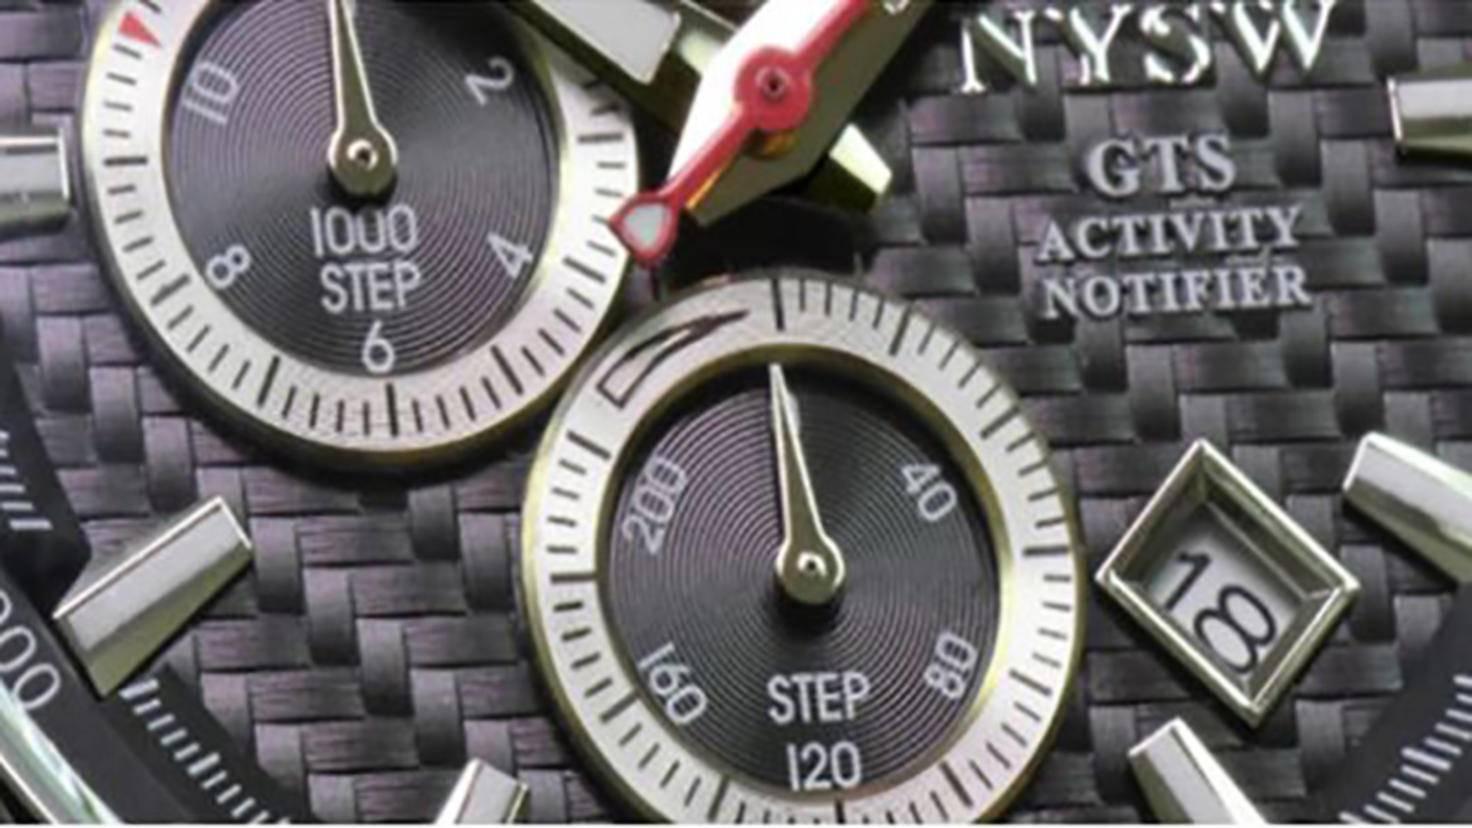 NYSW bei Kickstarter